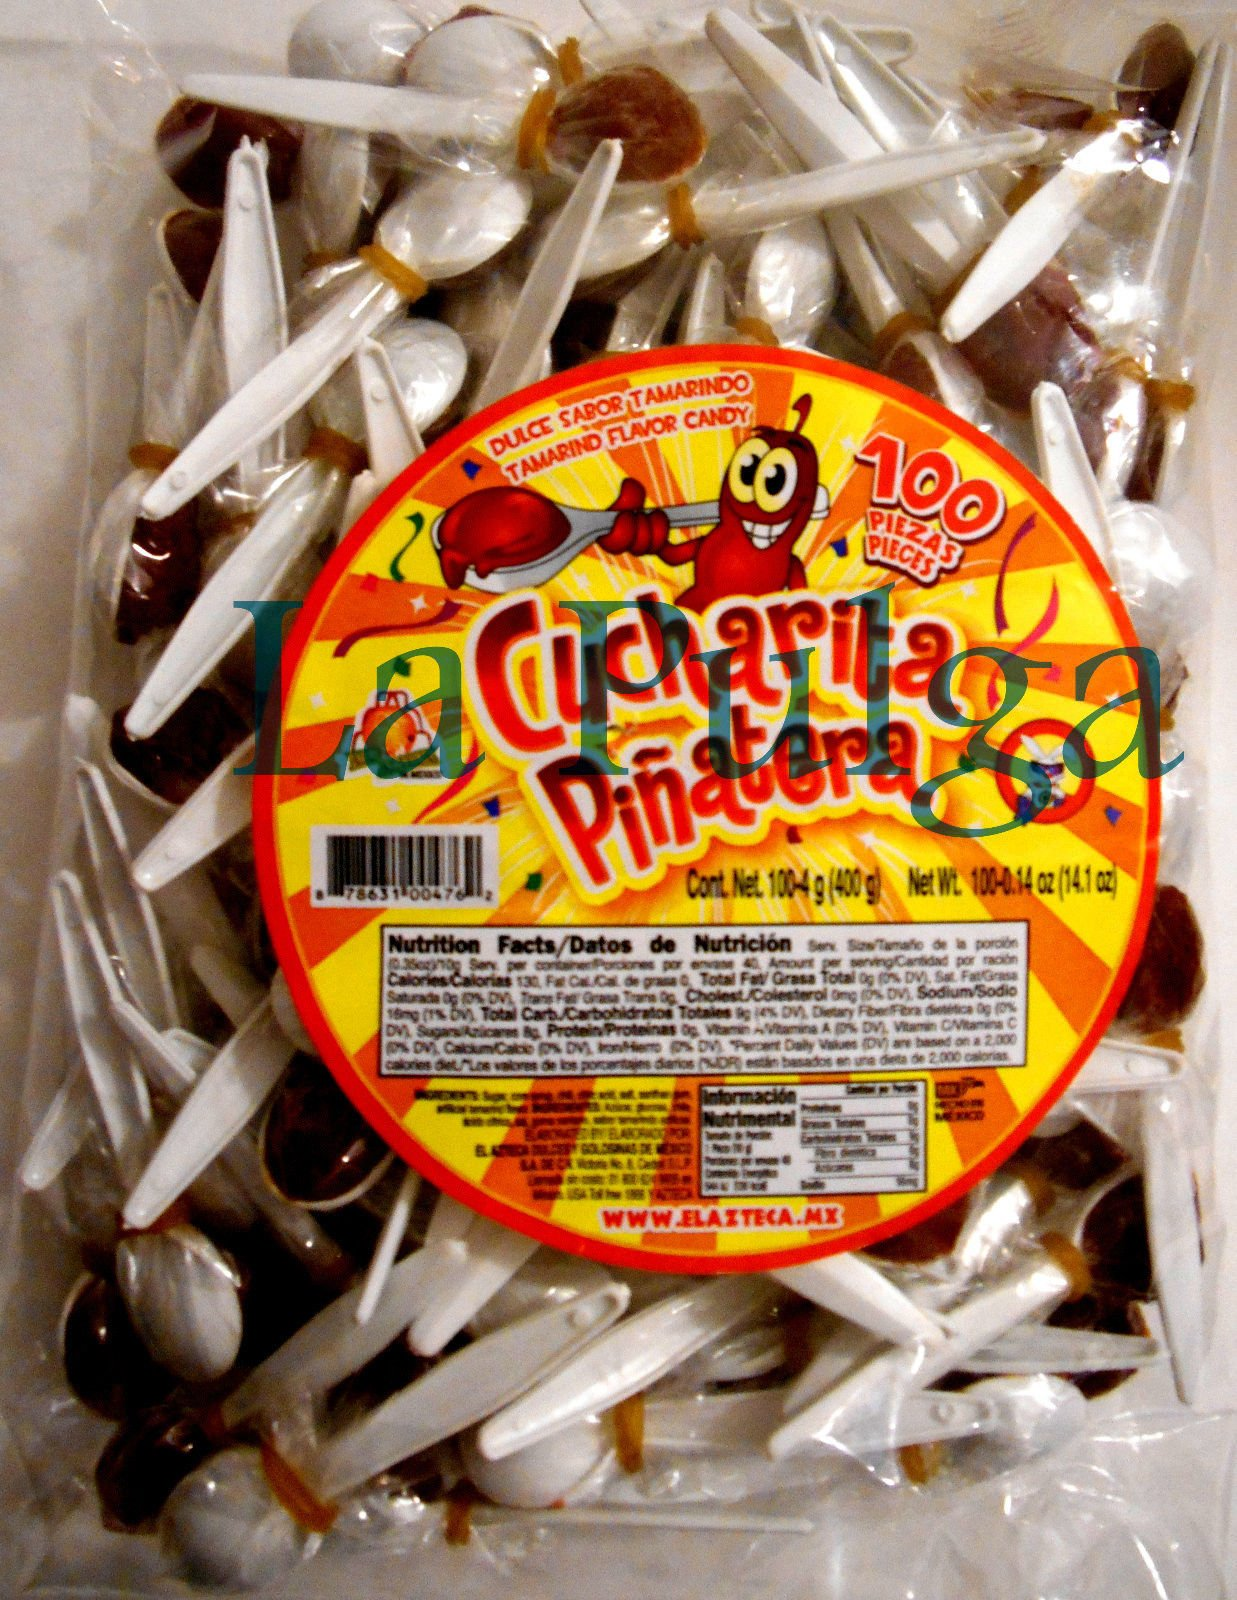 Cucharita Pinatera Tamarind Flavored Mexican Candy Spoon 100 pcs Tamarindo